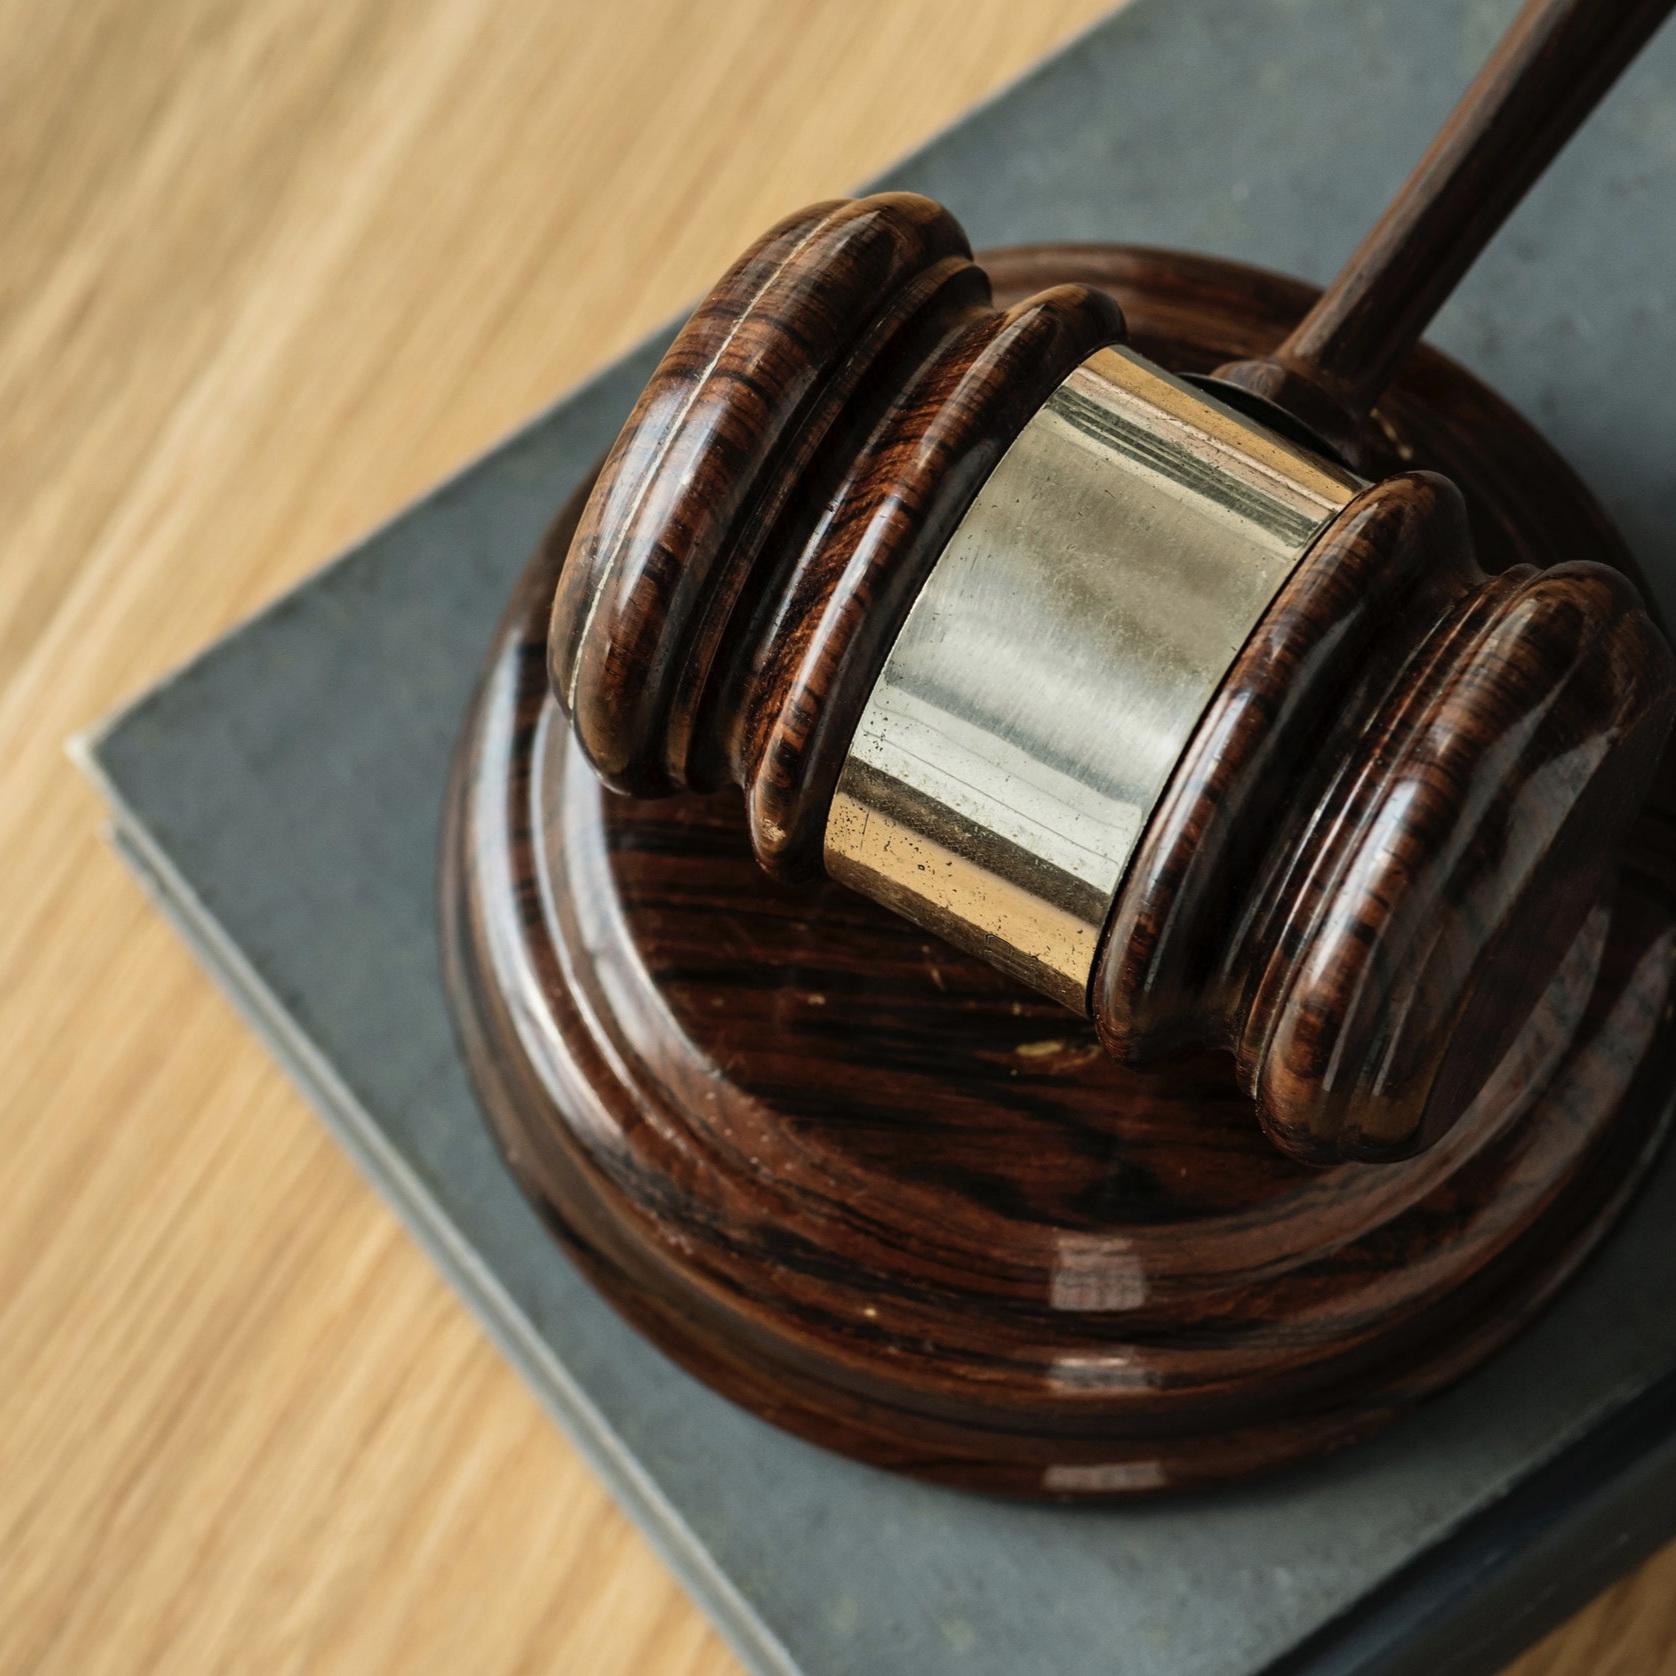 LEGAL - THE LEGAL DEPARTMENT